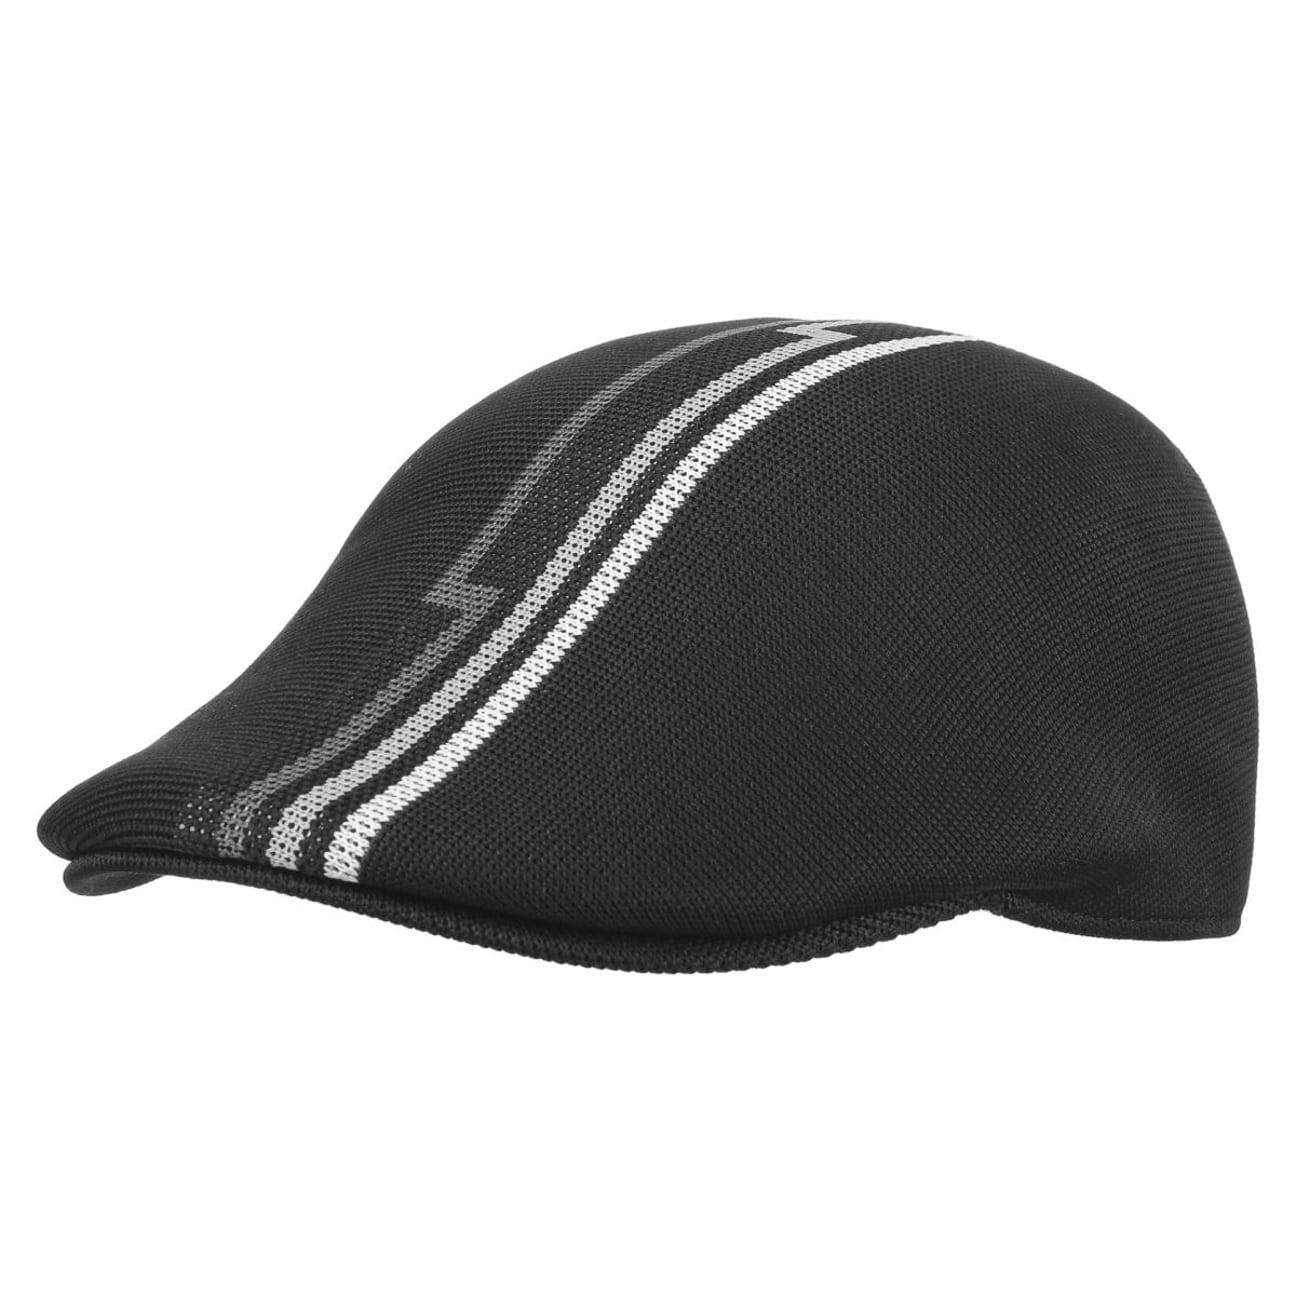 ... Aztec Stripe Flat Cap 507 by Kangol - black 1 ... 75f1ce247b5